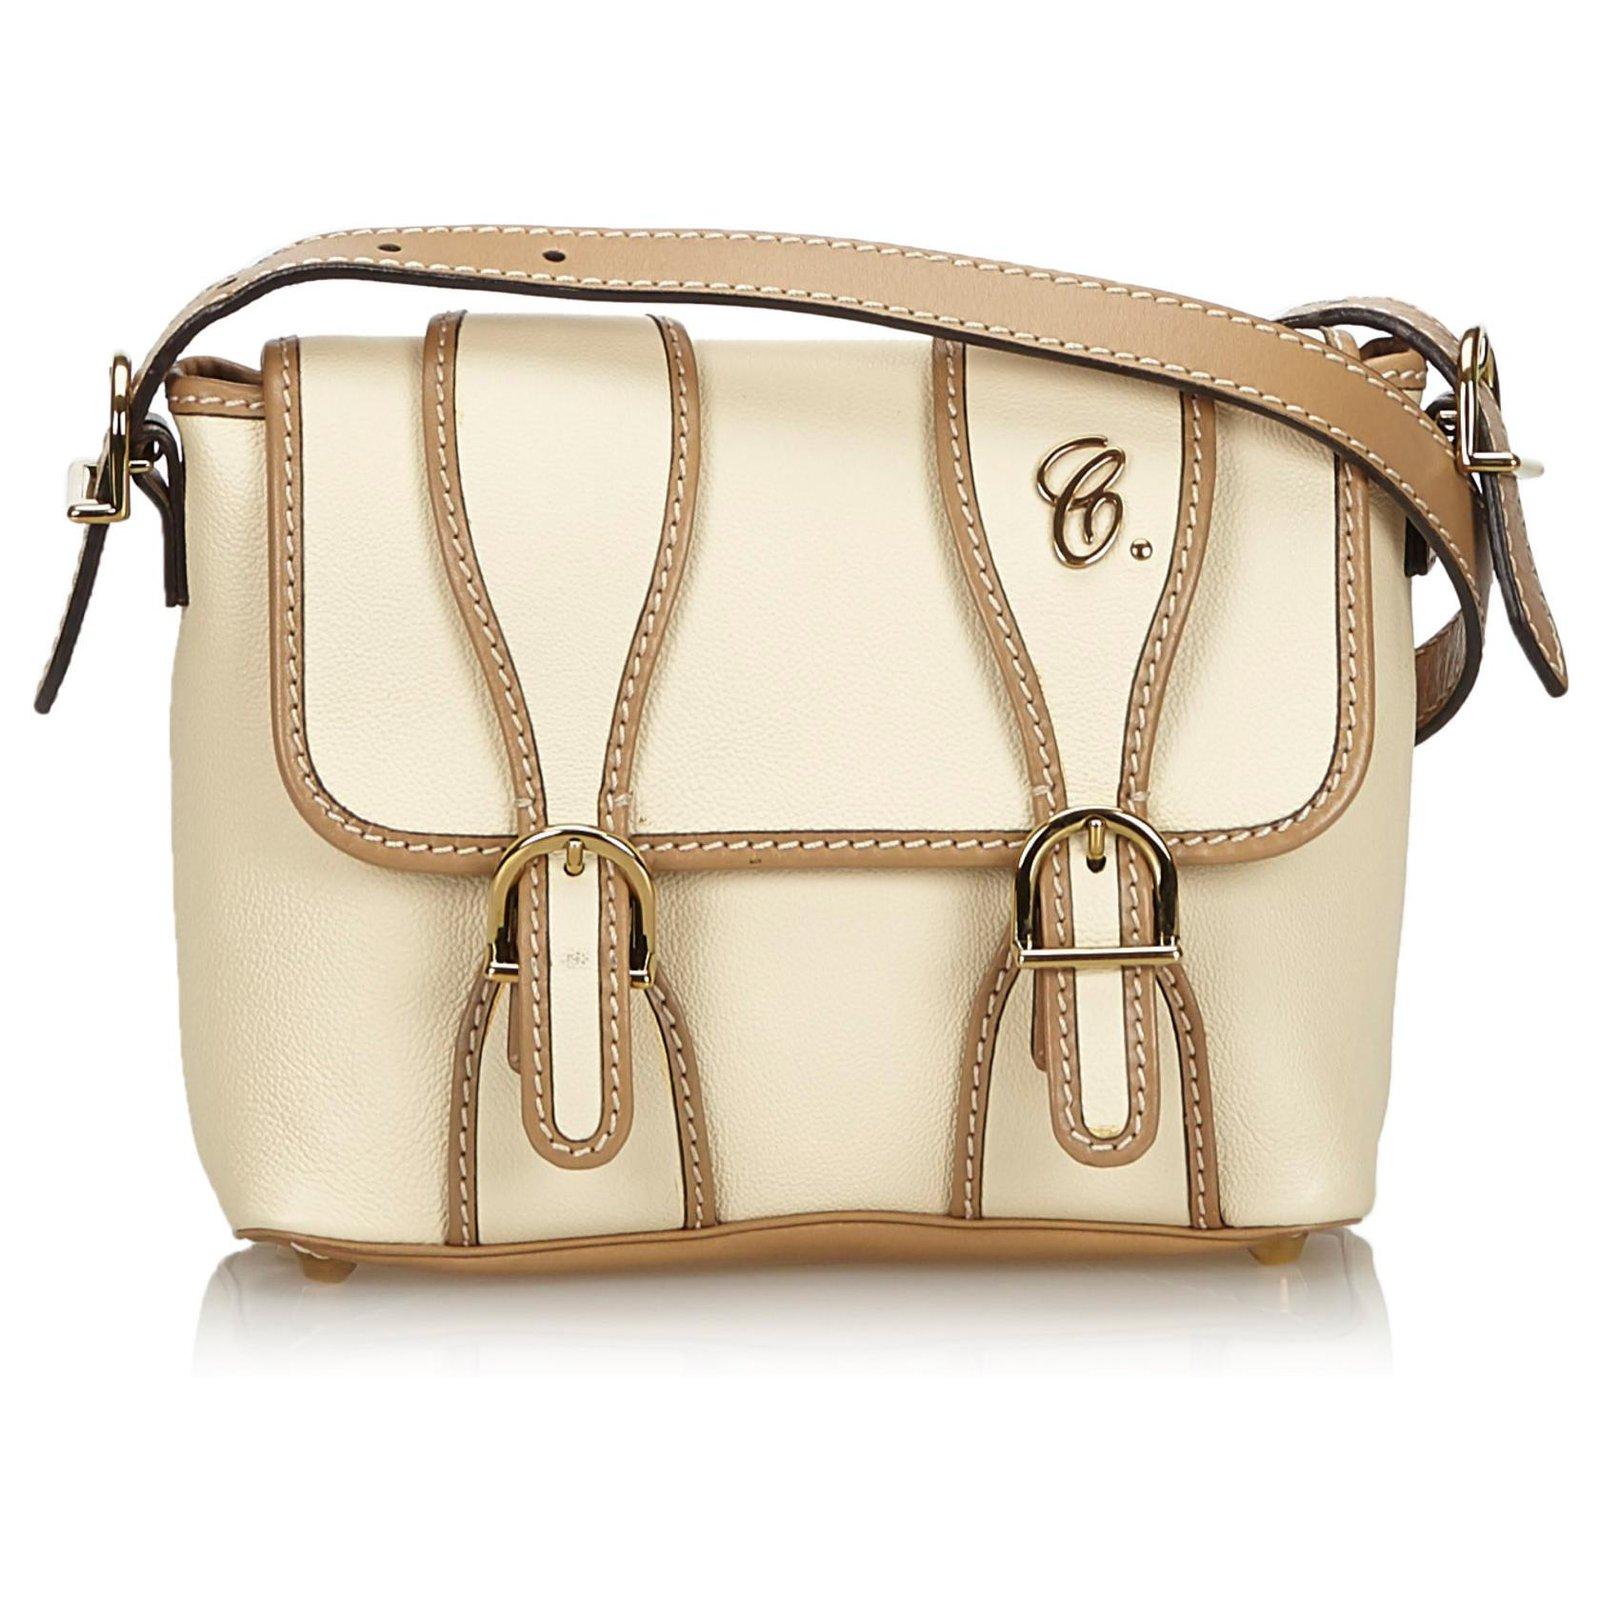 97a1798a7f Chloe White Leather Susan Crossbody Bag